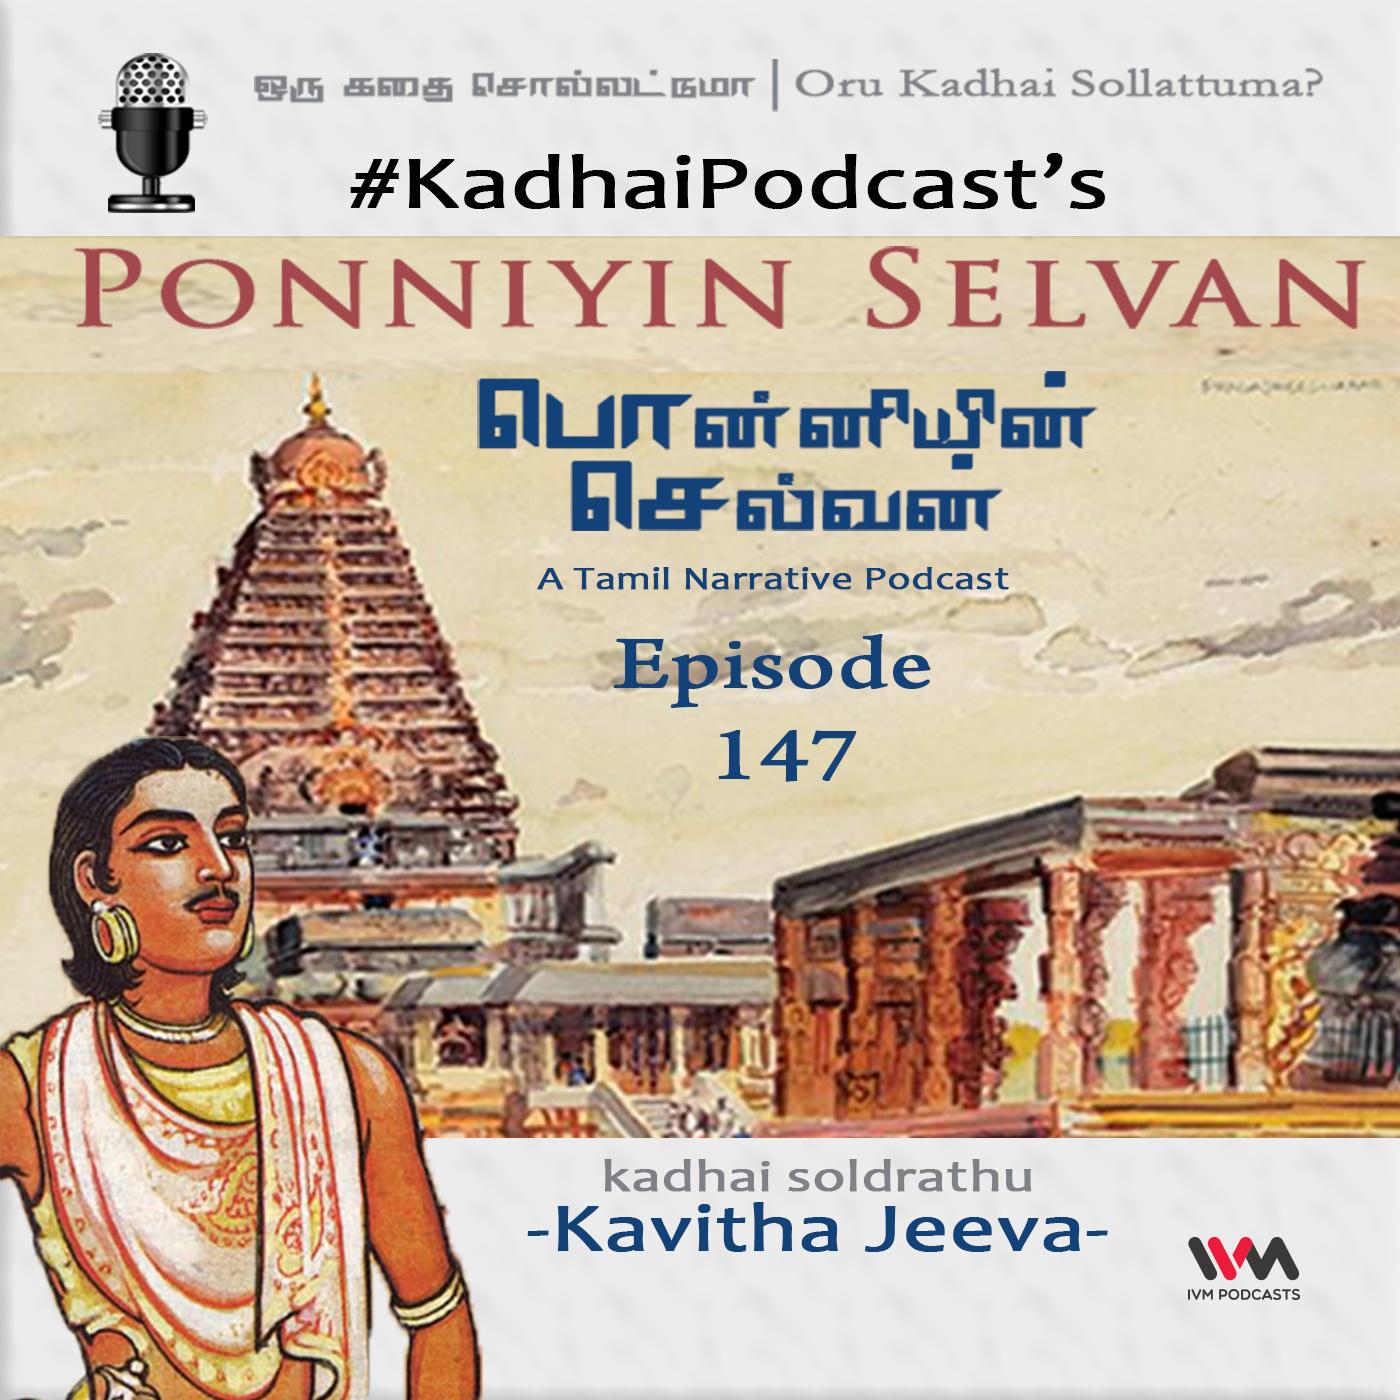 KadhaiPodcast's Ponniyin Selvan - Episode # 147